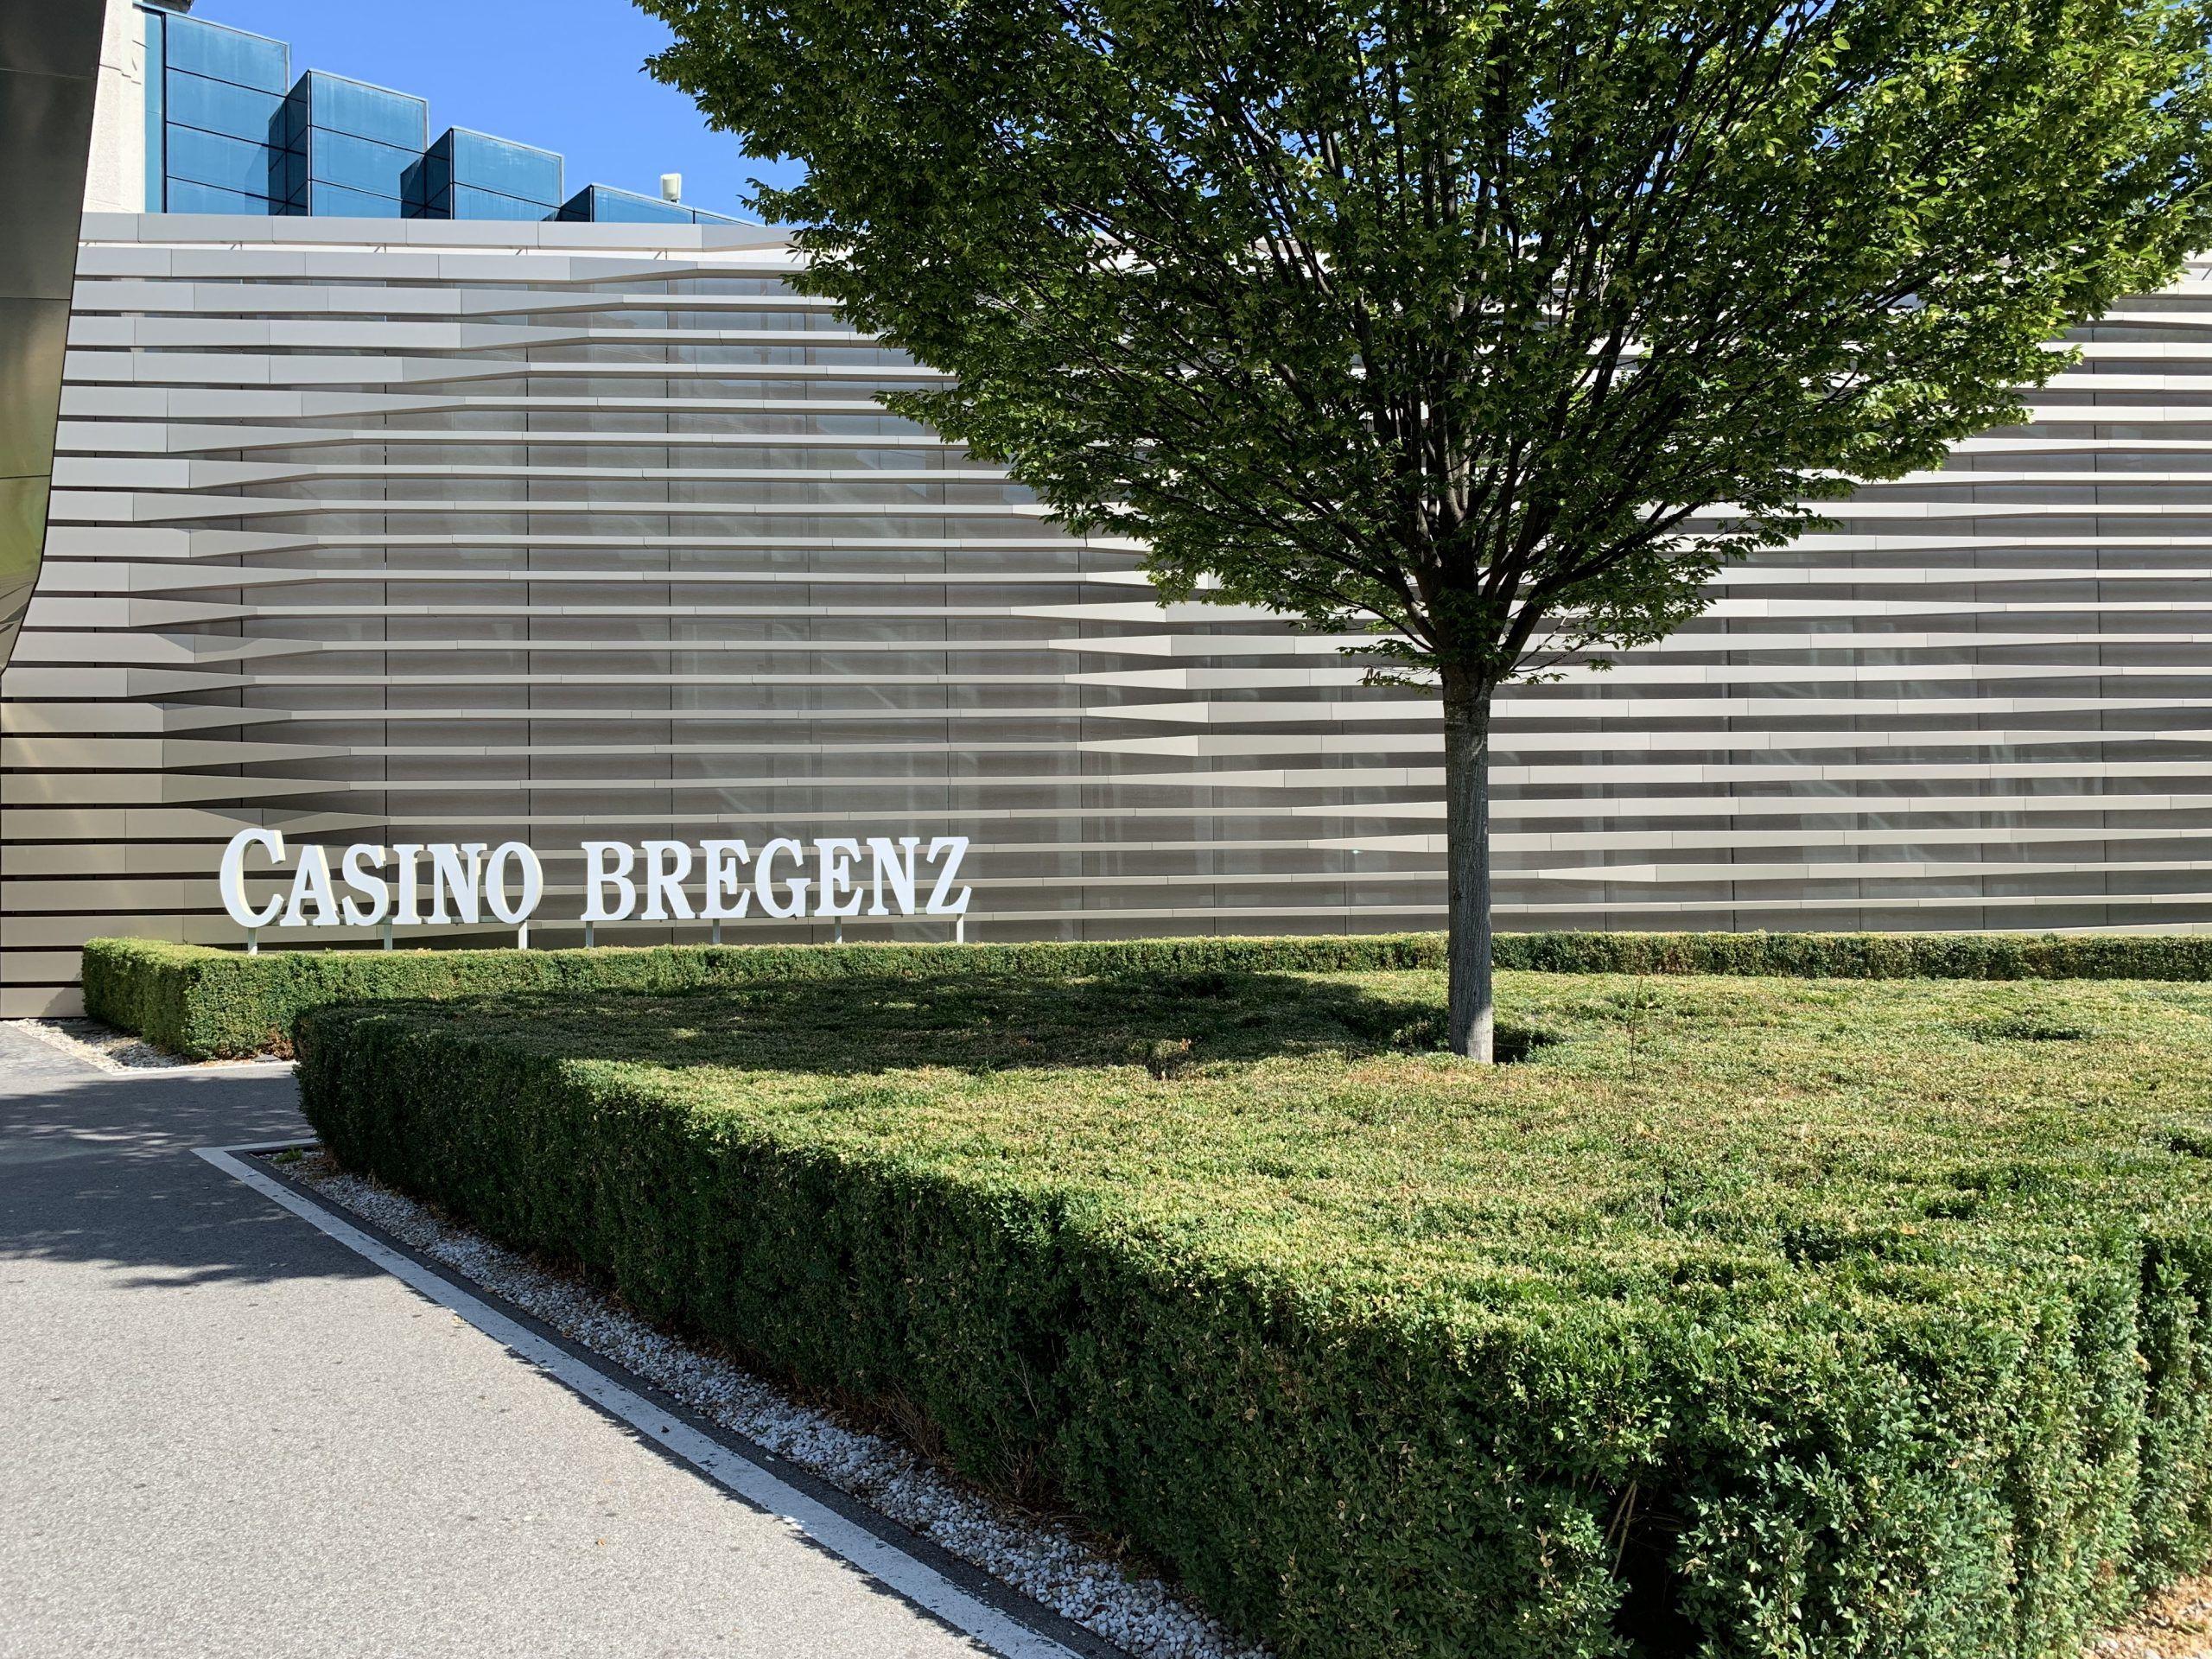 Testlauf im Casino Bregenz